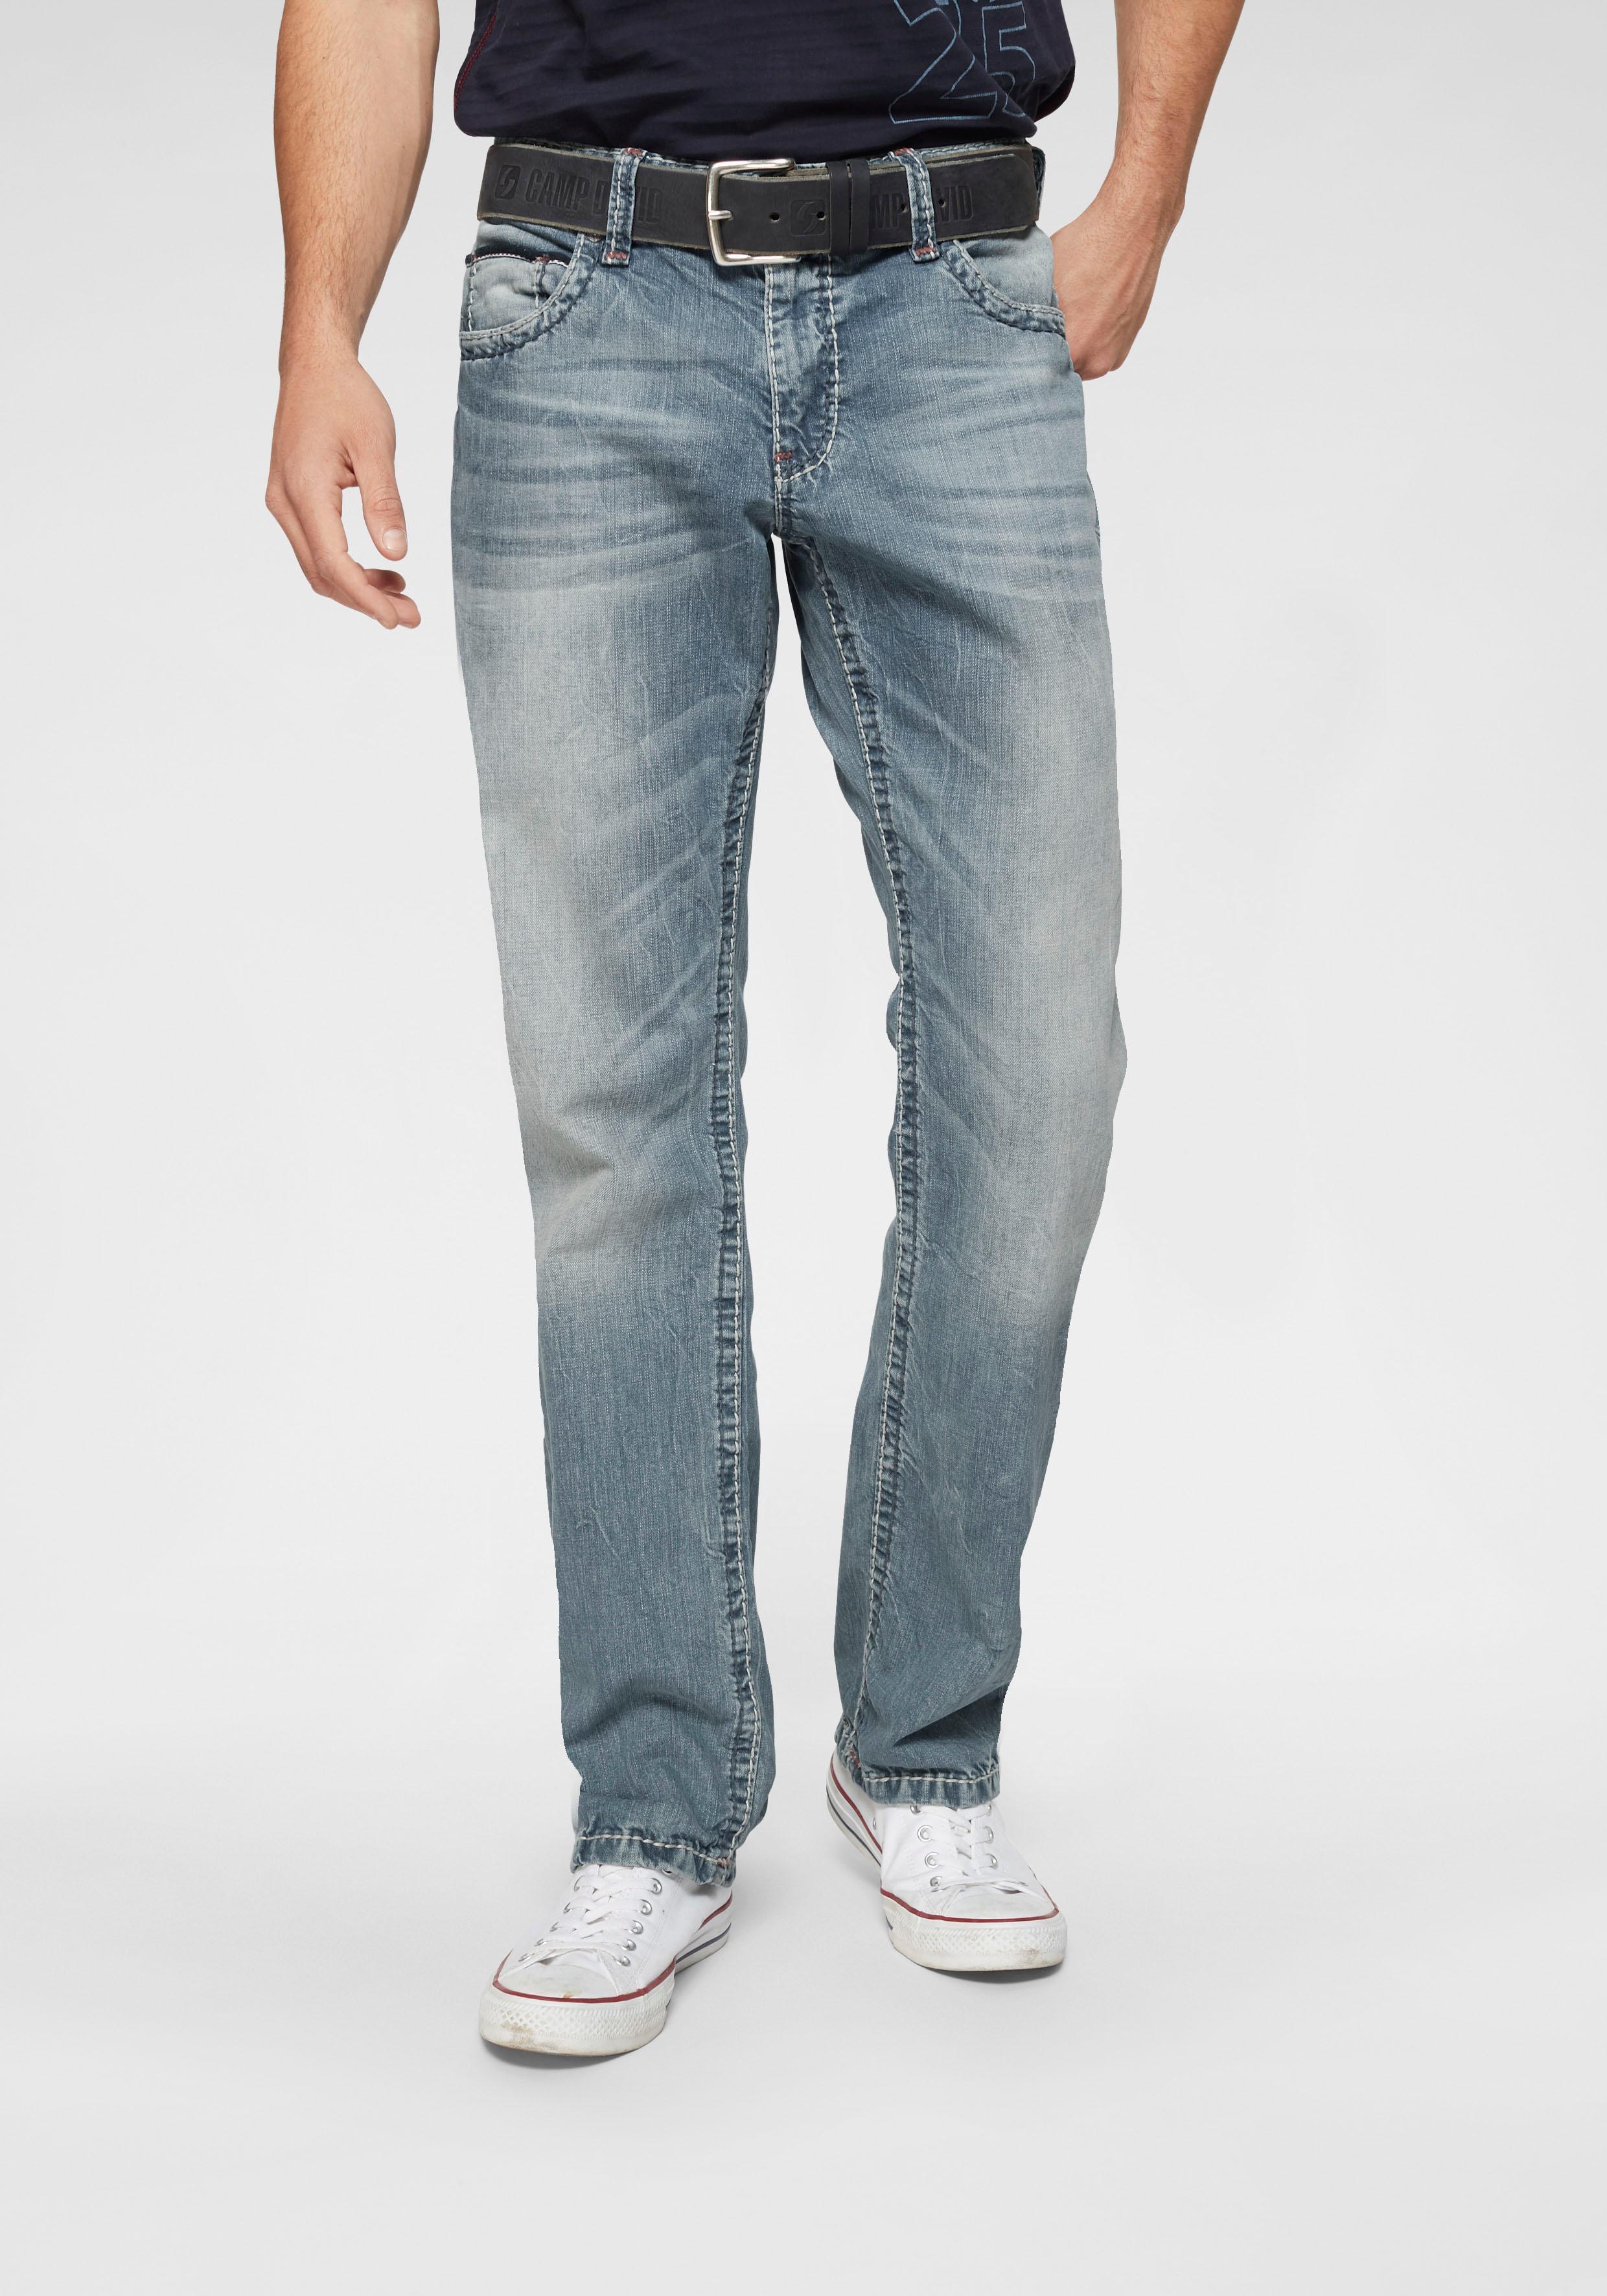 CAMP DAVID Loose-fit-Jeans CO:NO:C622   Bekleidung > Jeans   Blau   Camp David